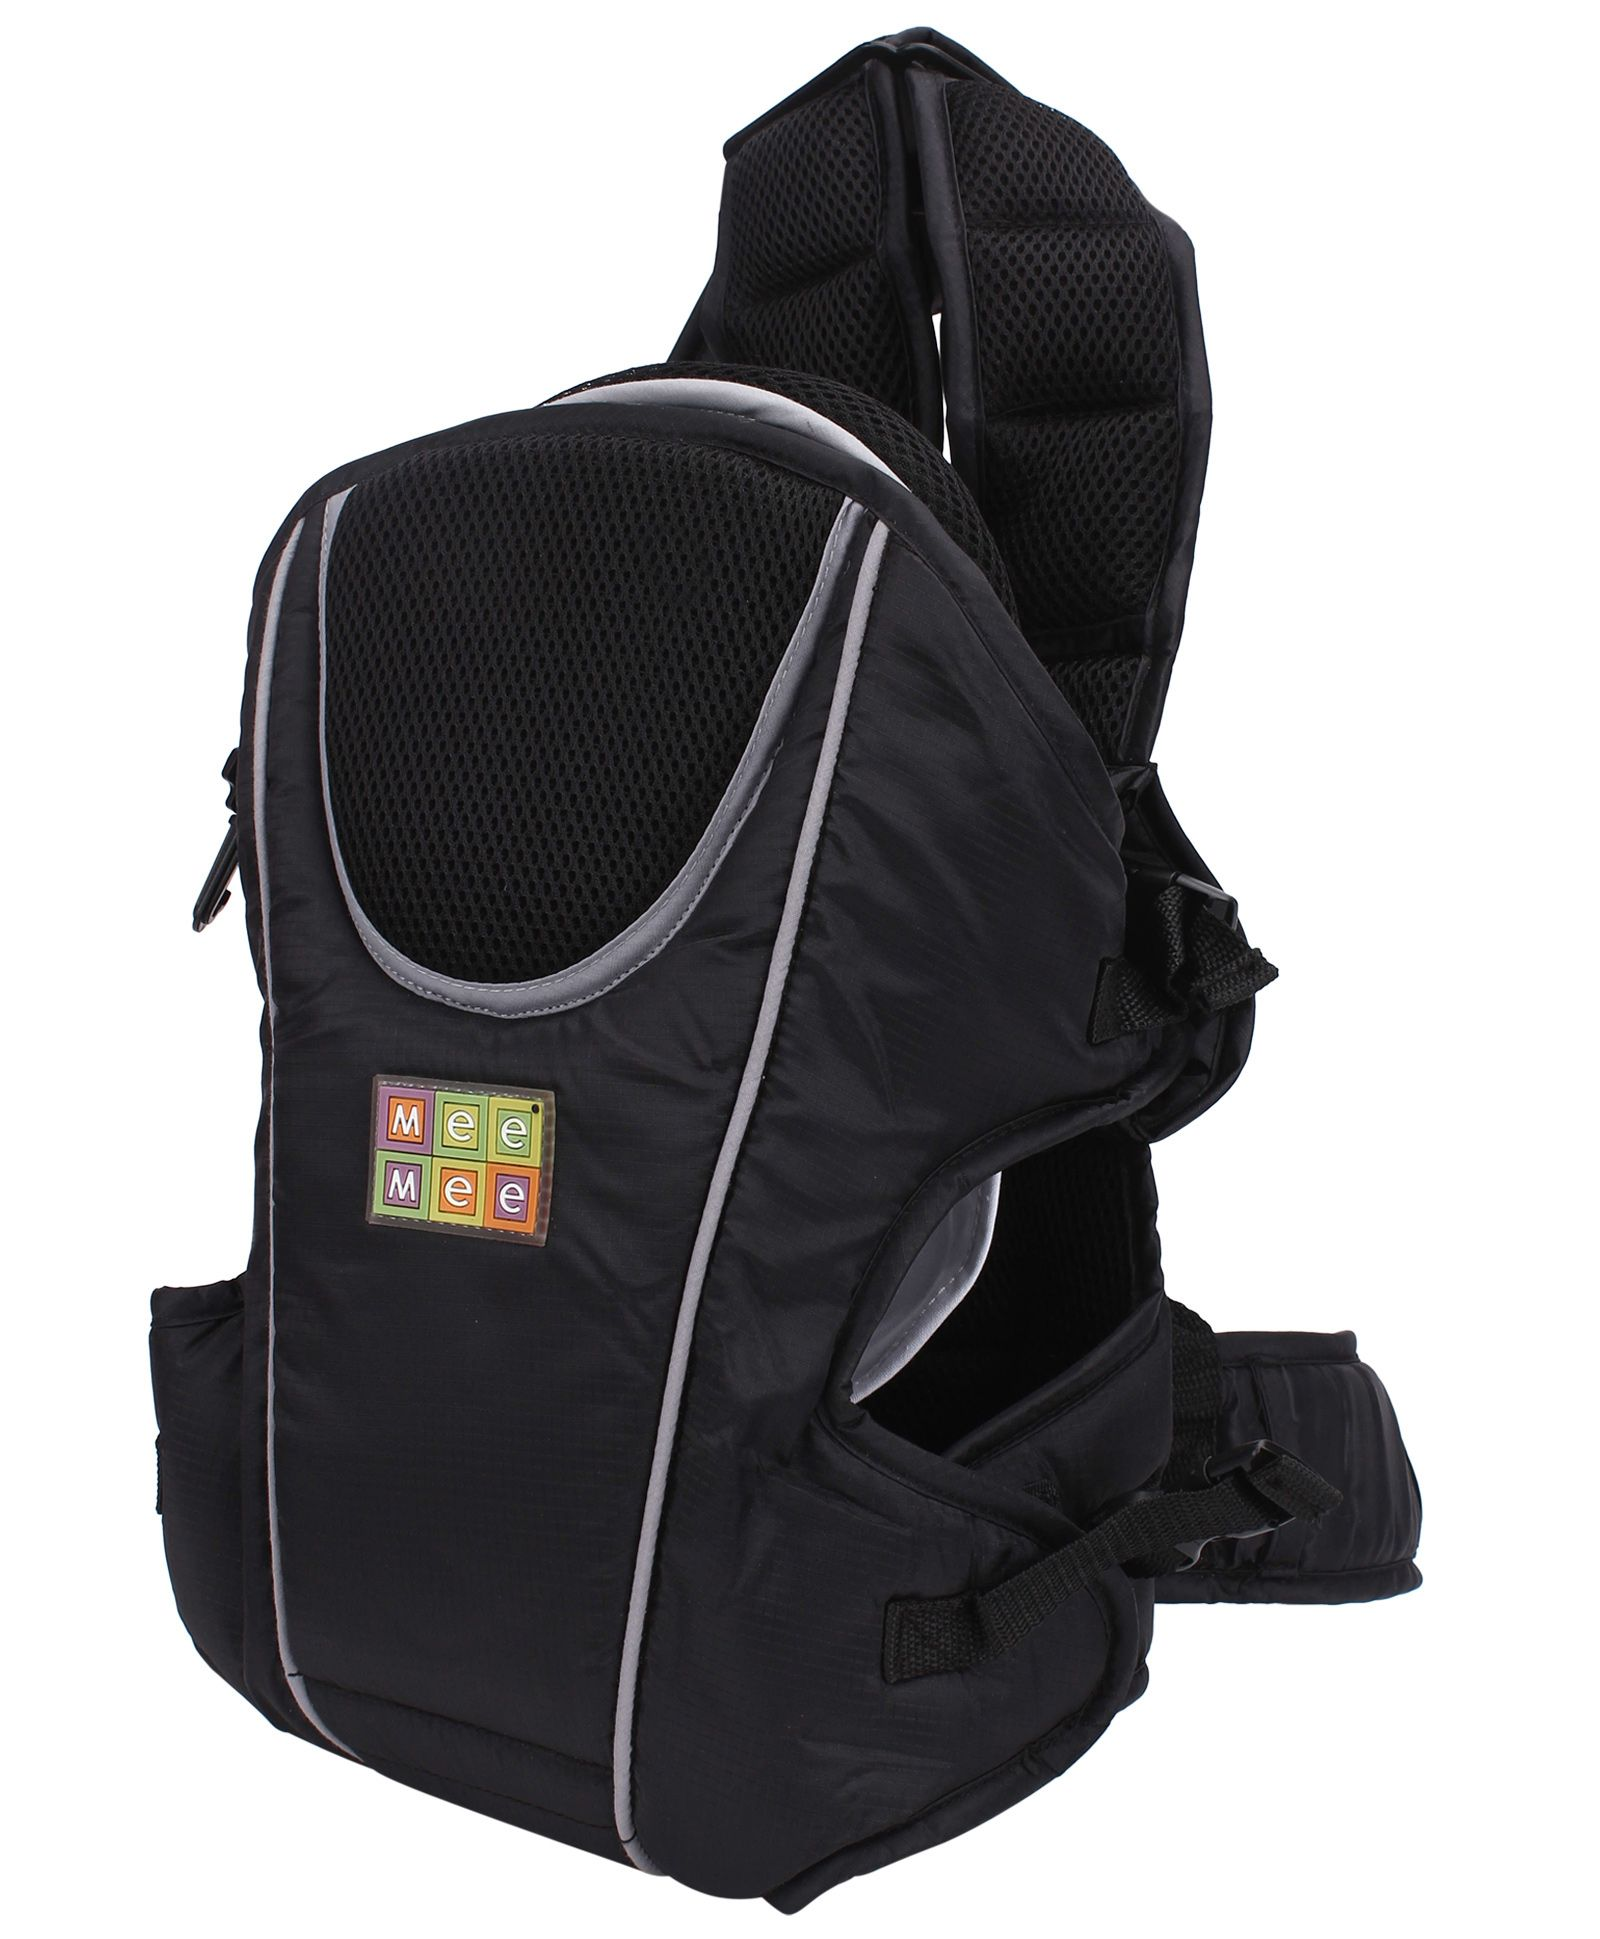 Mee Mee Soft & Premium 4 Way Baby Carrier - Black